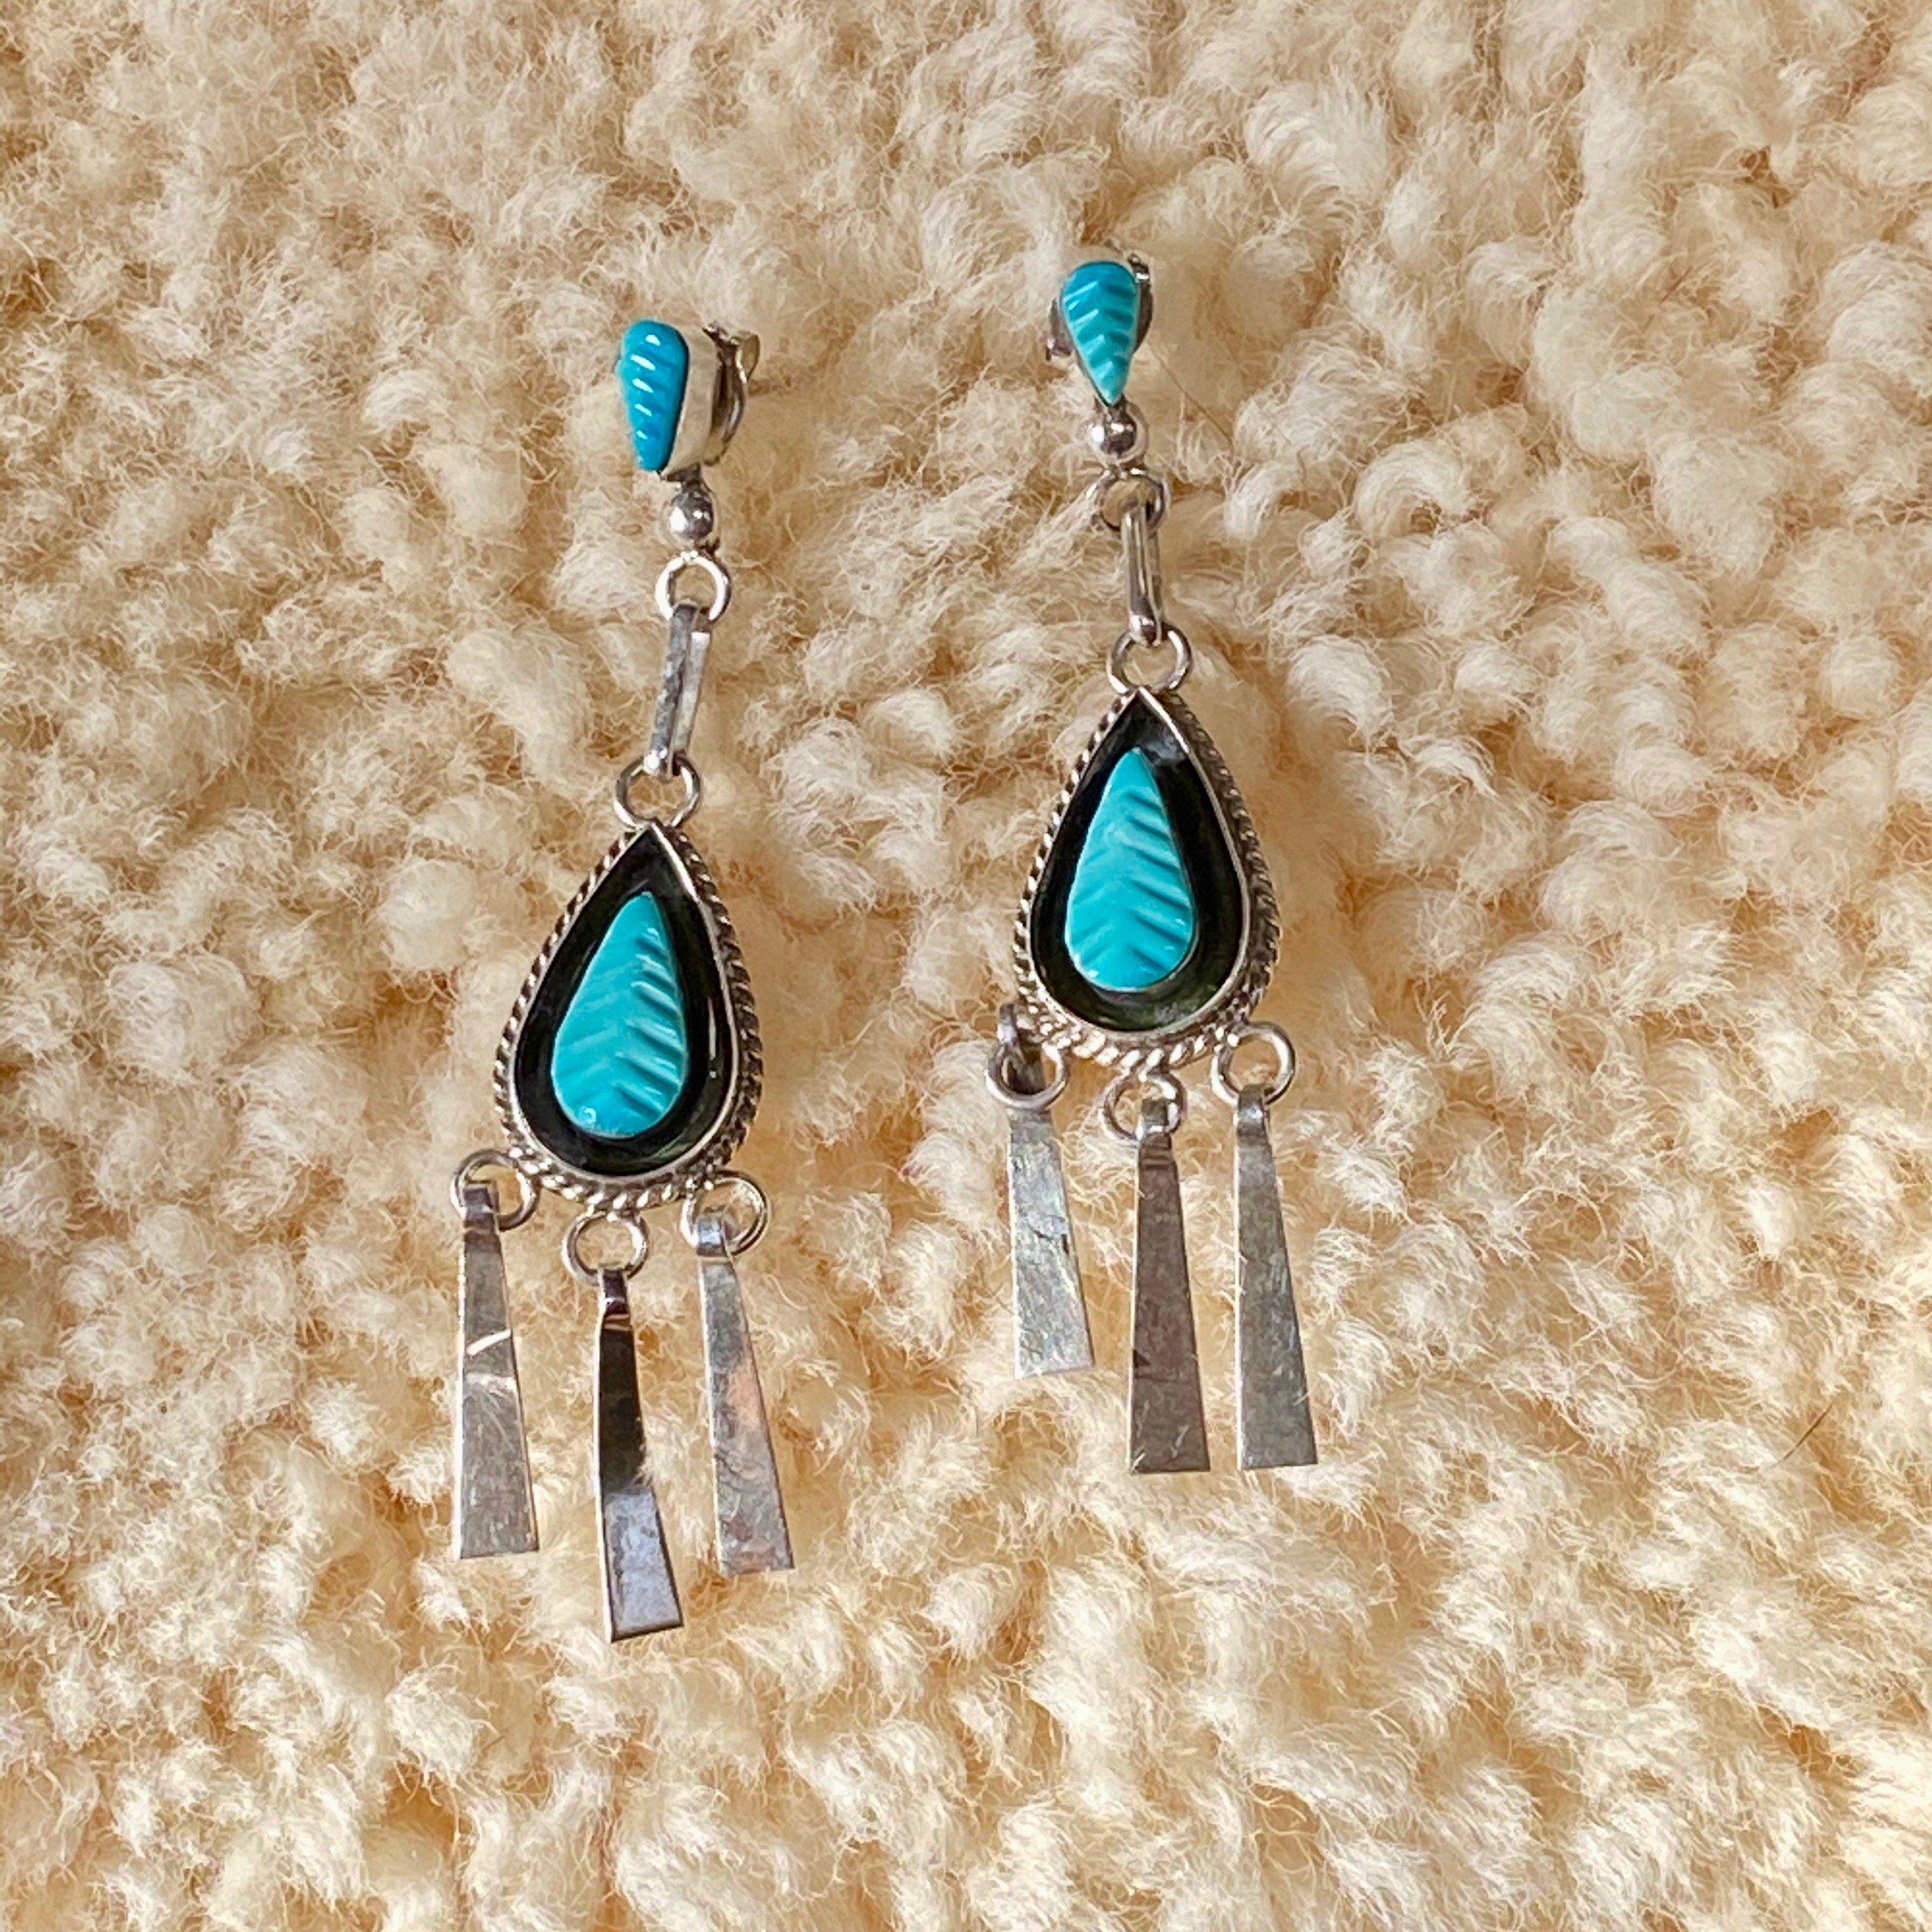 Zuni Carved Leaf Turquoise Pierced Earrings in Sterling Silver